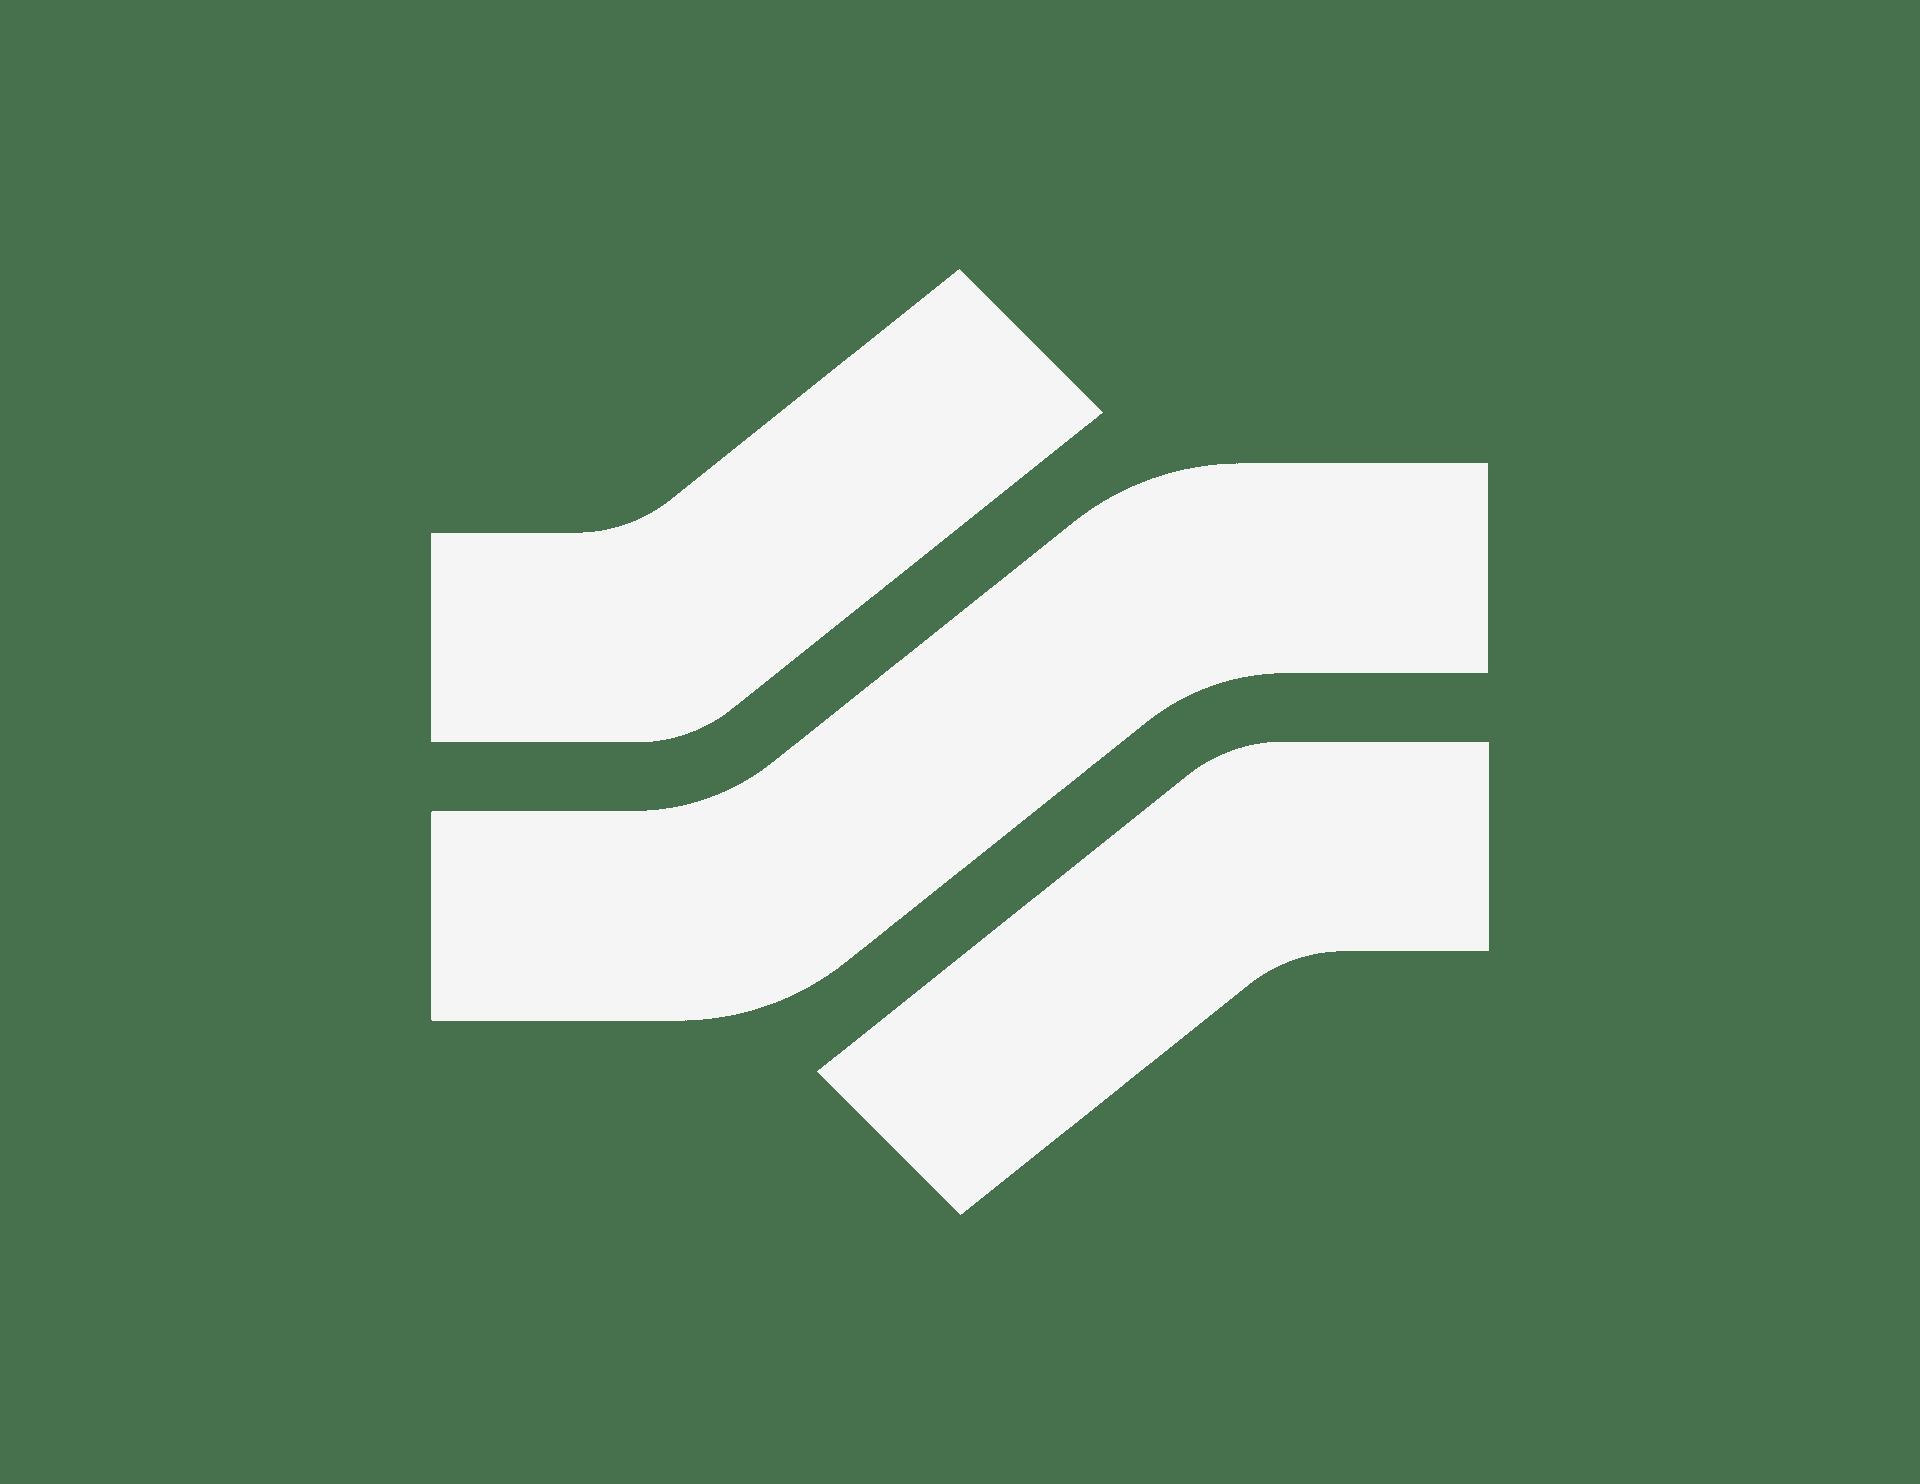 gatik_symbol_2